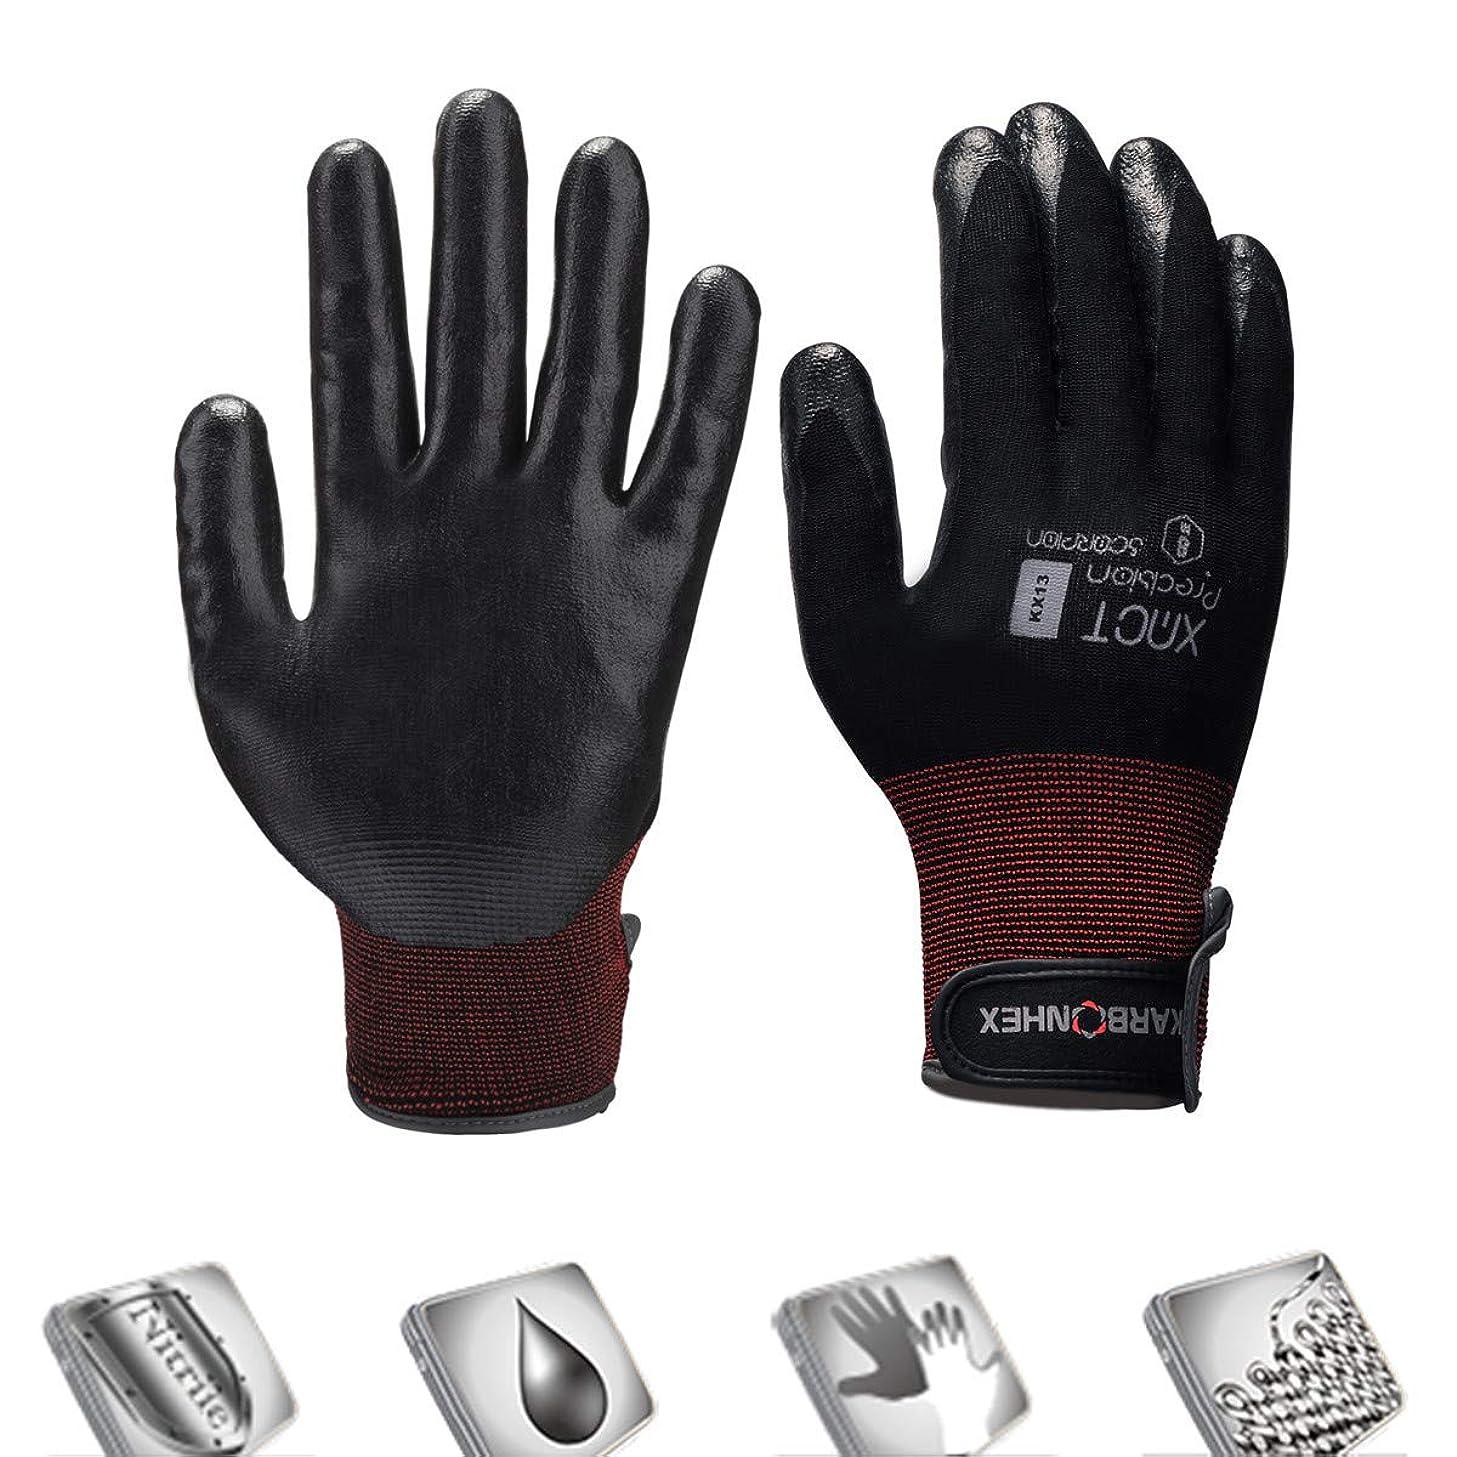 OCGIG Oily Work Gloves Nitrile Coated Industrial Grip Repair Safety Glove KX-13,XL